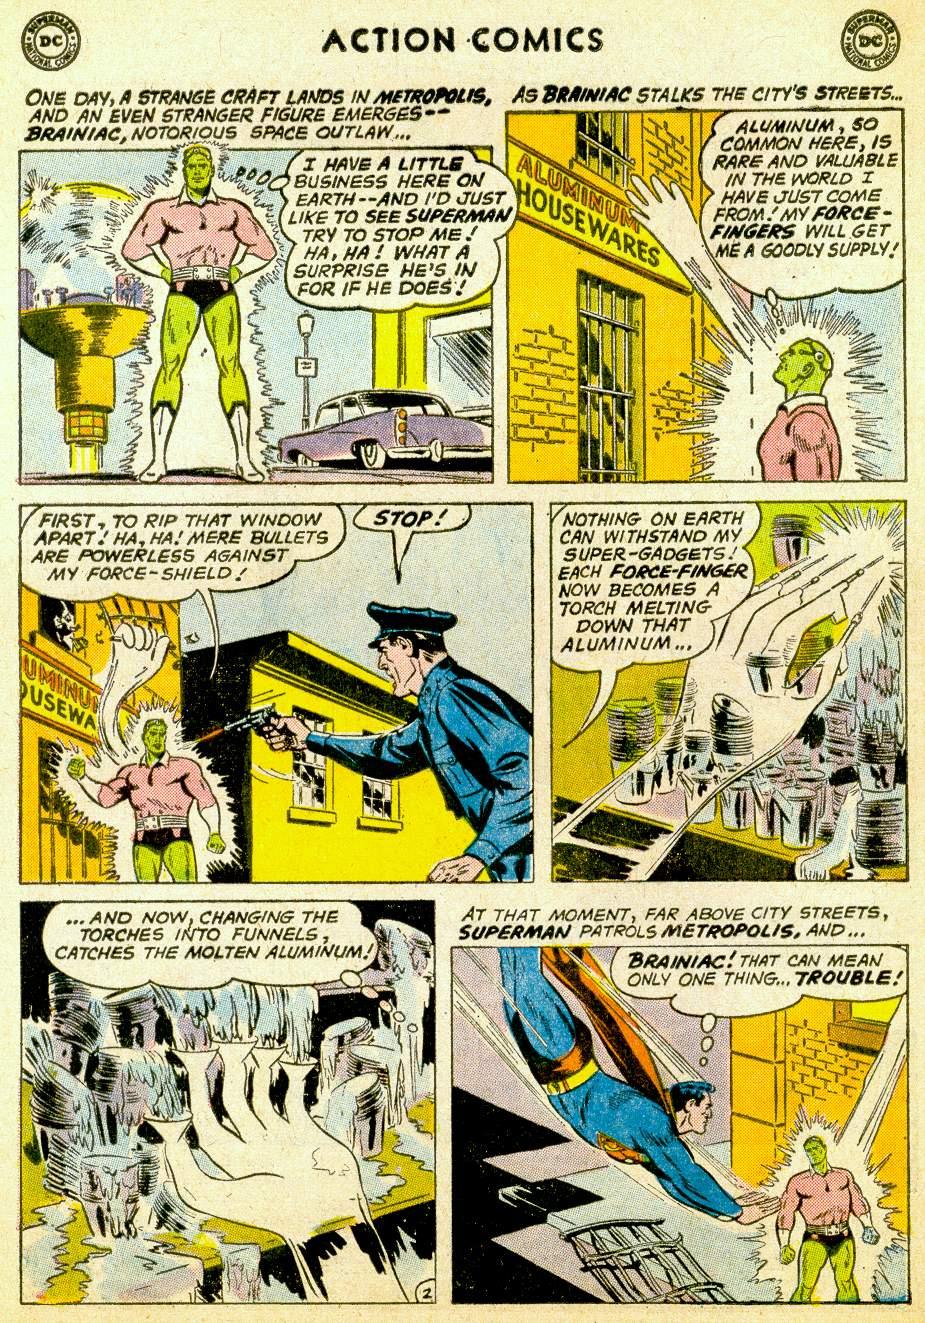 Action Comics (1938) 275 Page 3